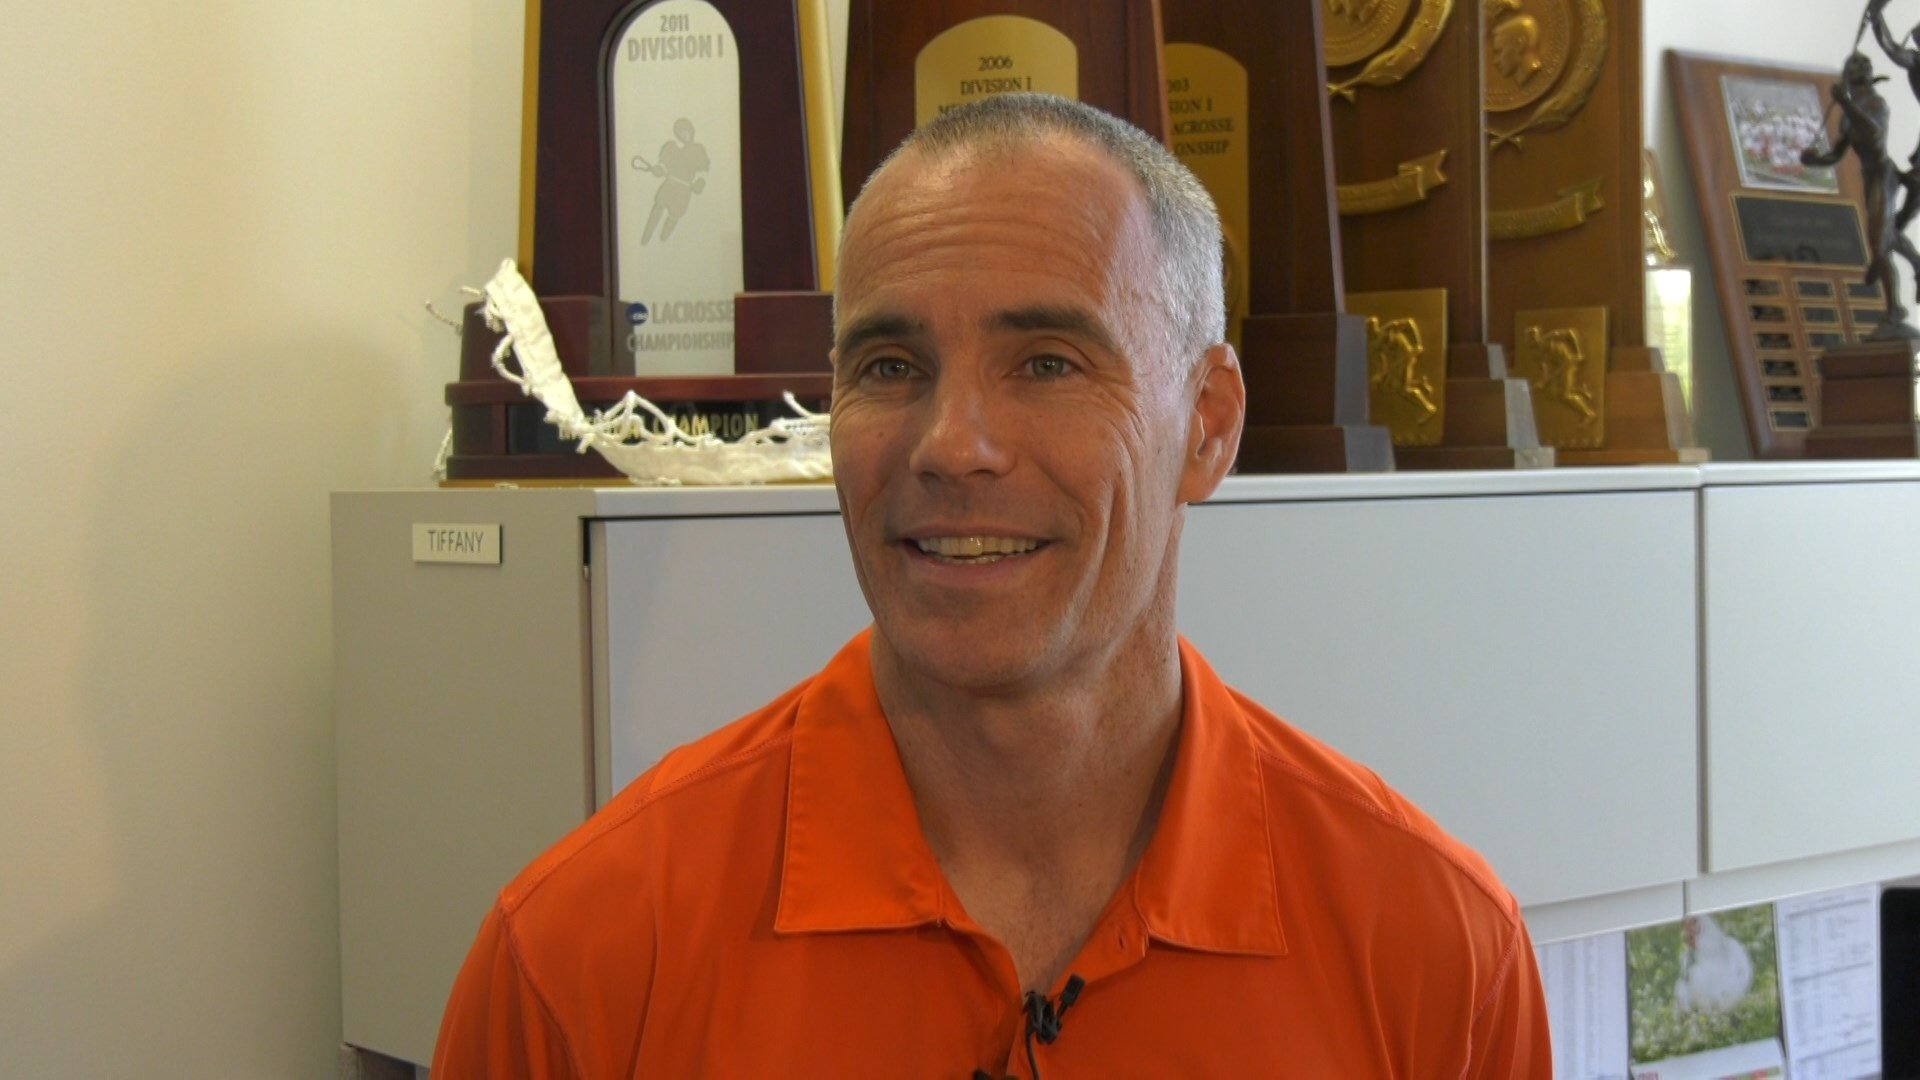 UVA men's lacrosse coach Lars Tiffany